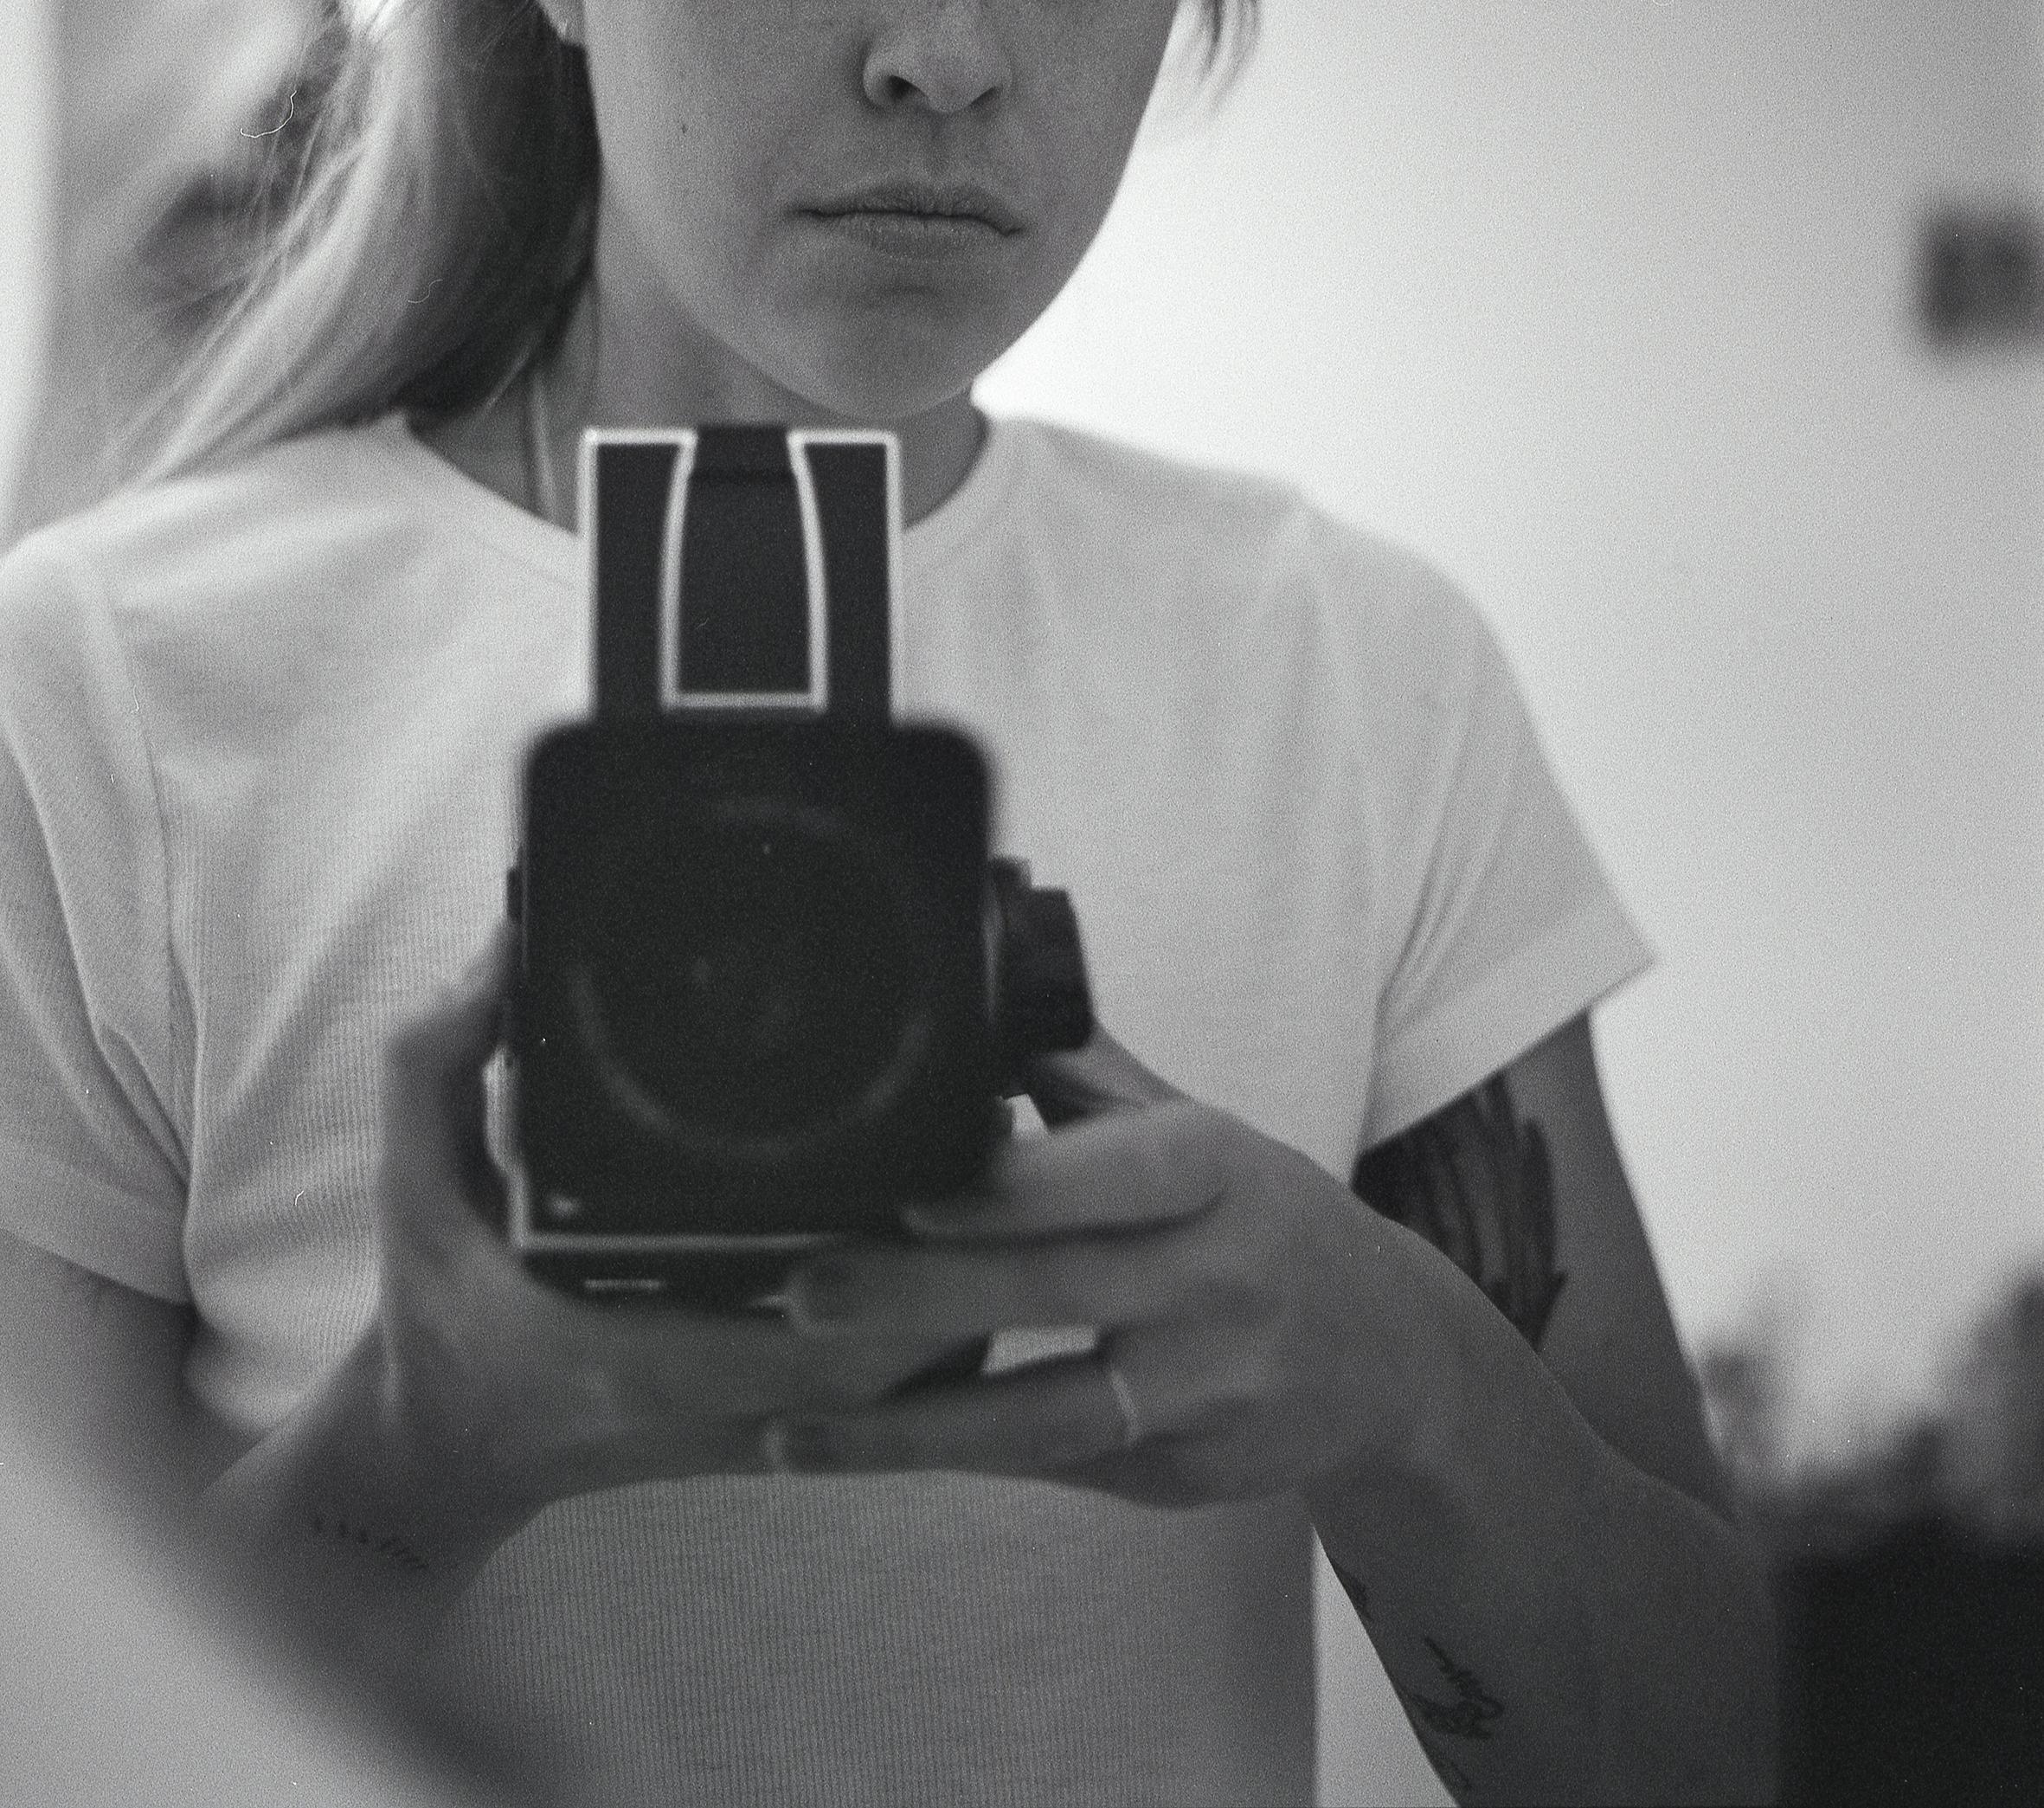 20171201_Zelfportret Hasseblad_Anne-Claire Lans.jpg